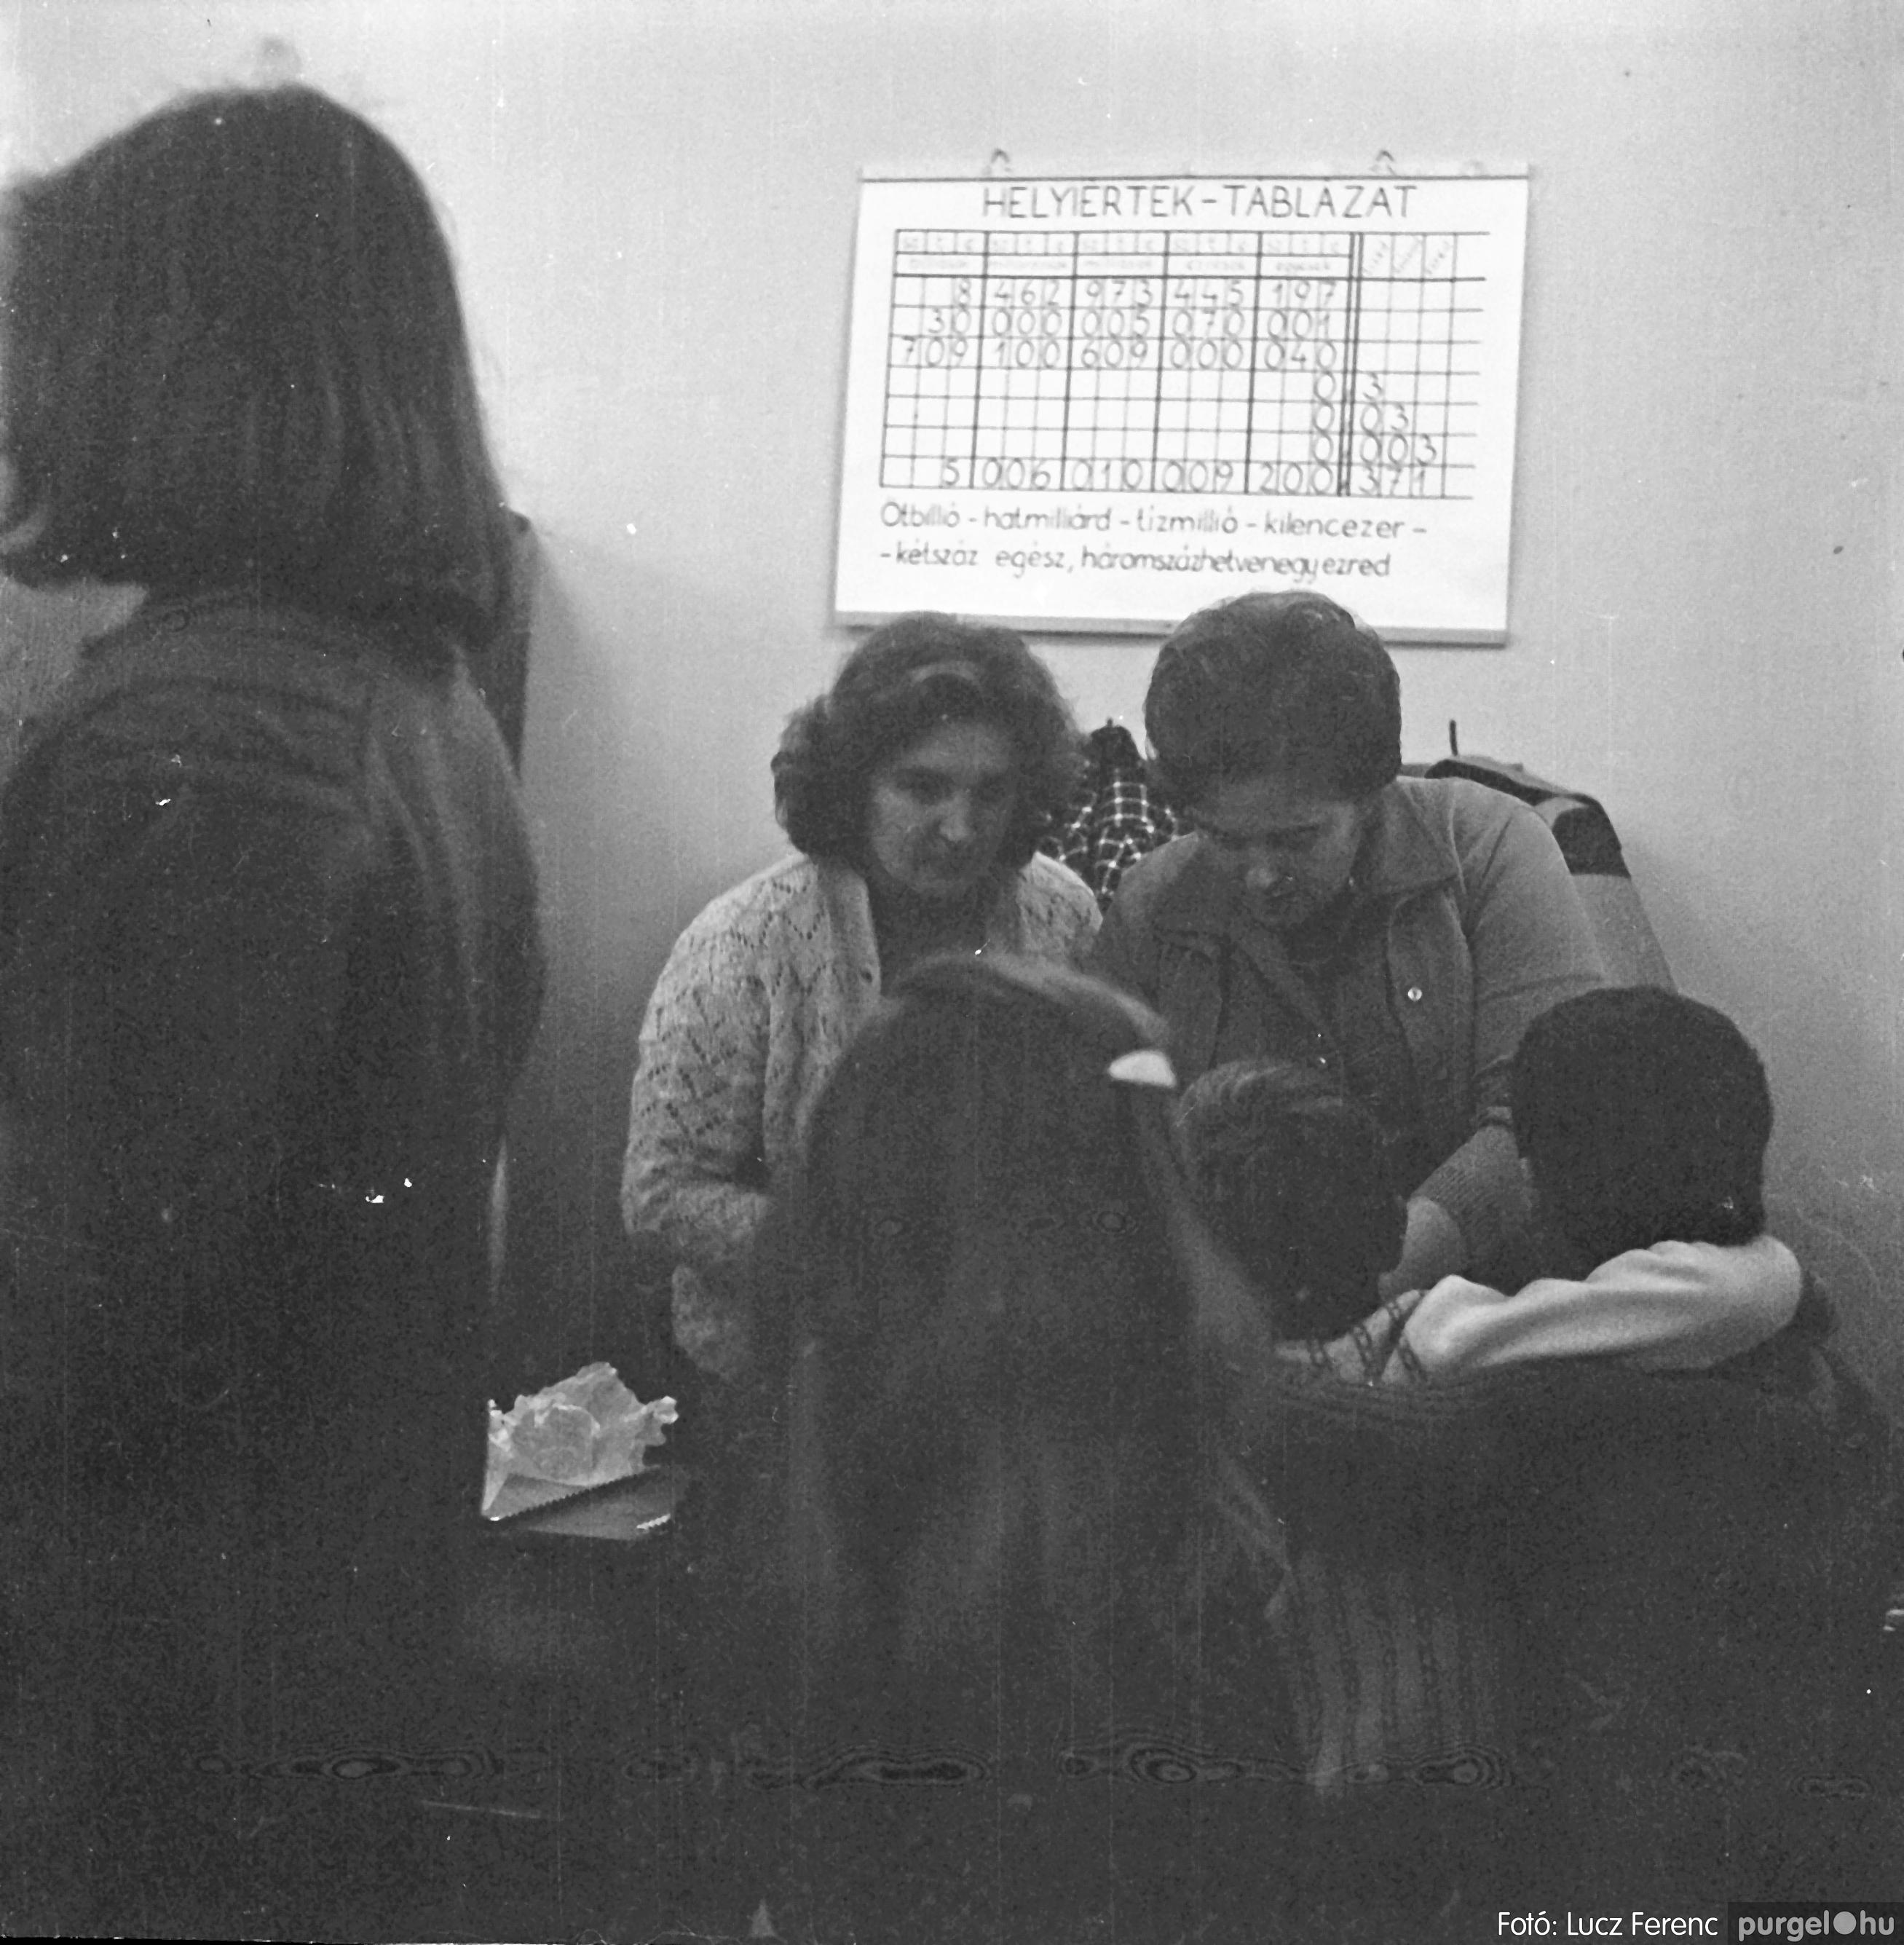 027. 1975. Buli a kultúrban 018. - Fotó: Lucz Ferenc.jpg